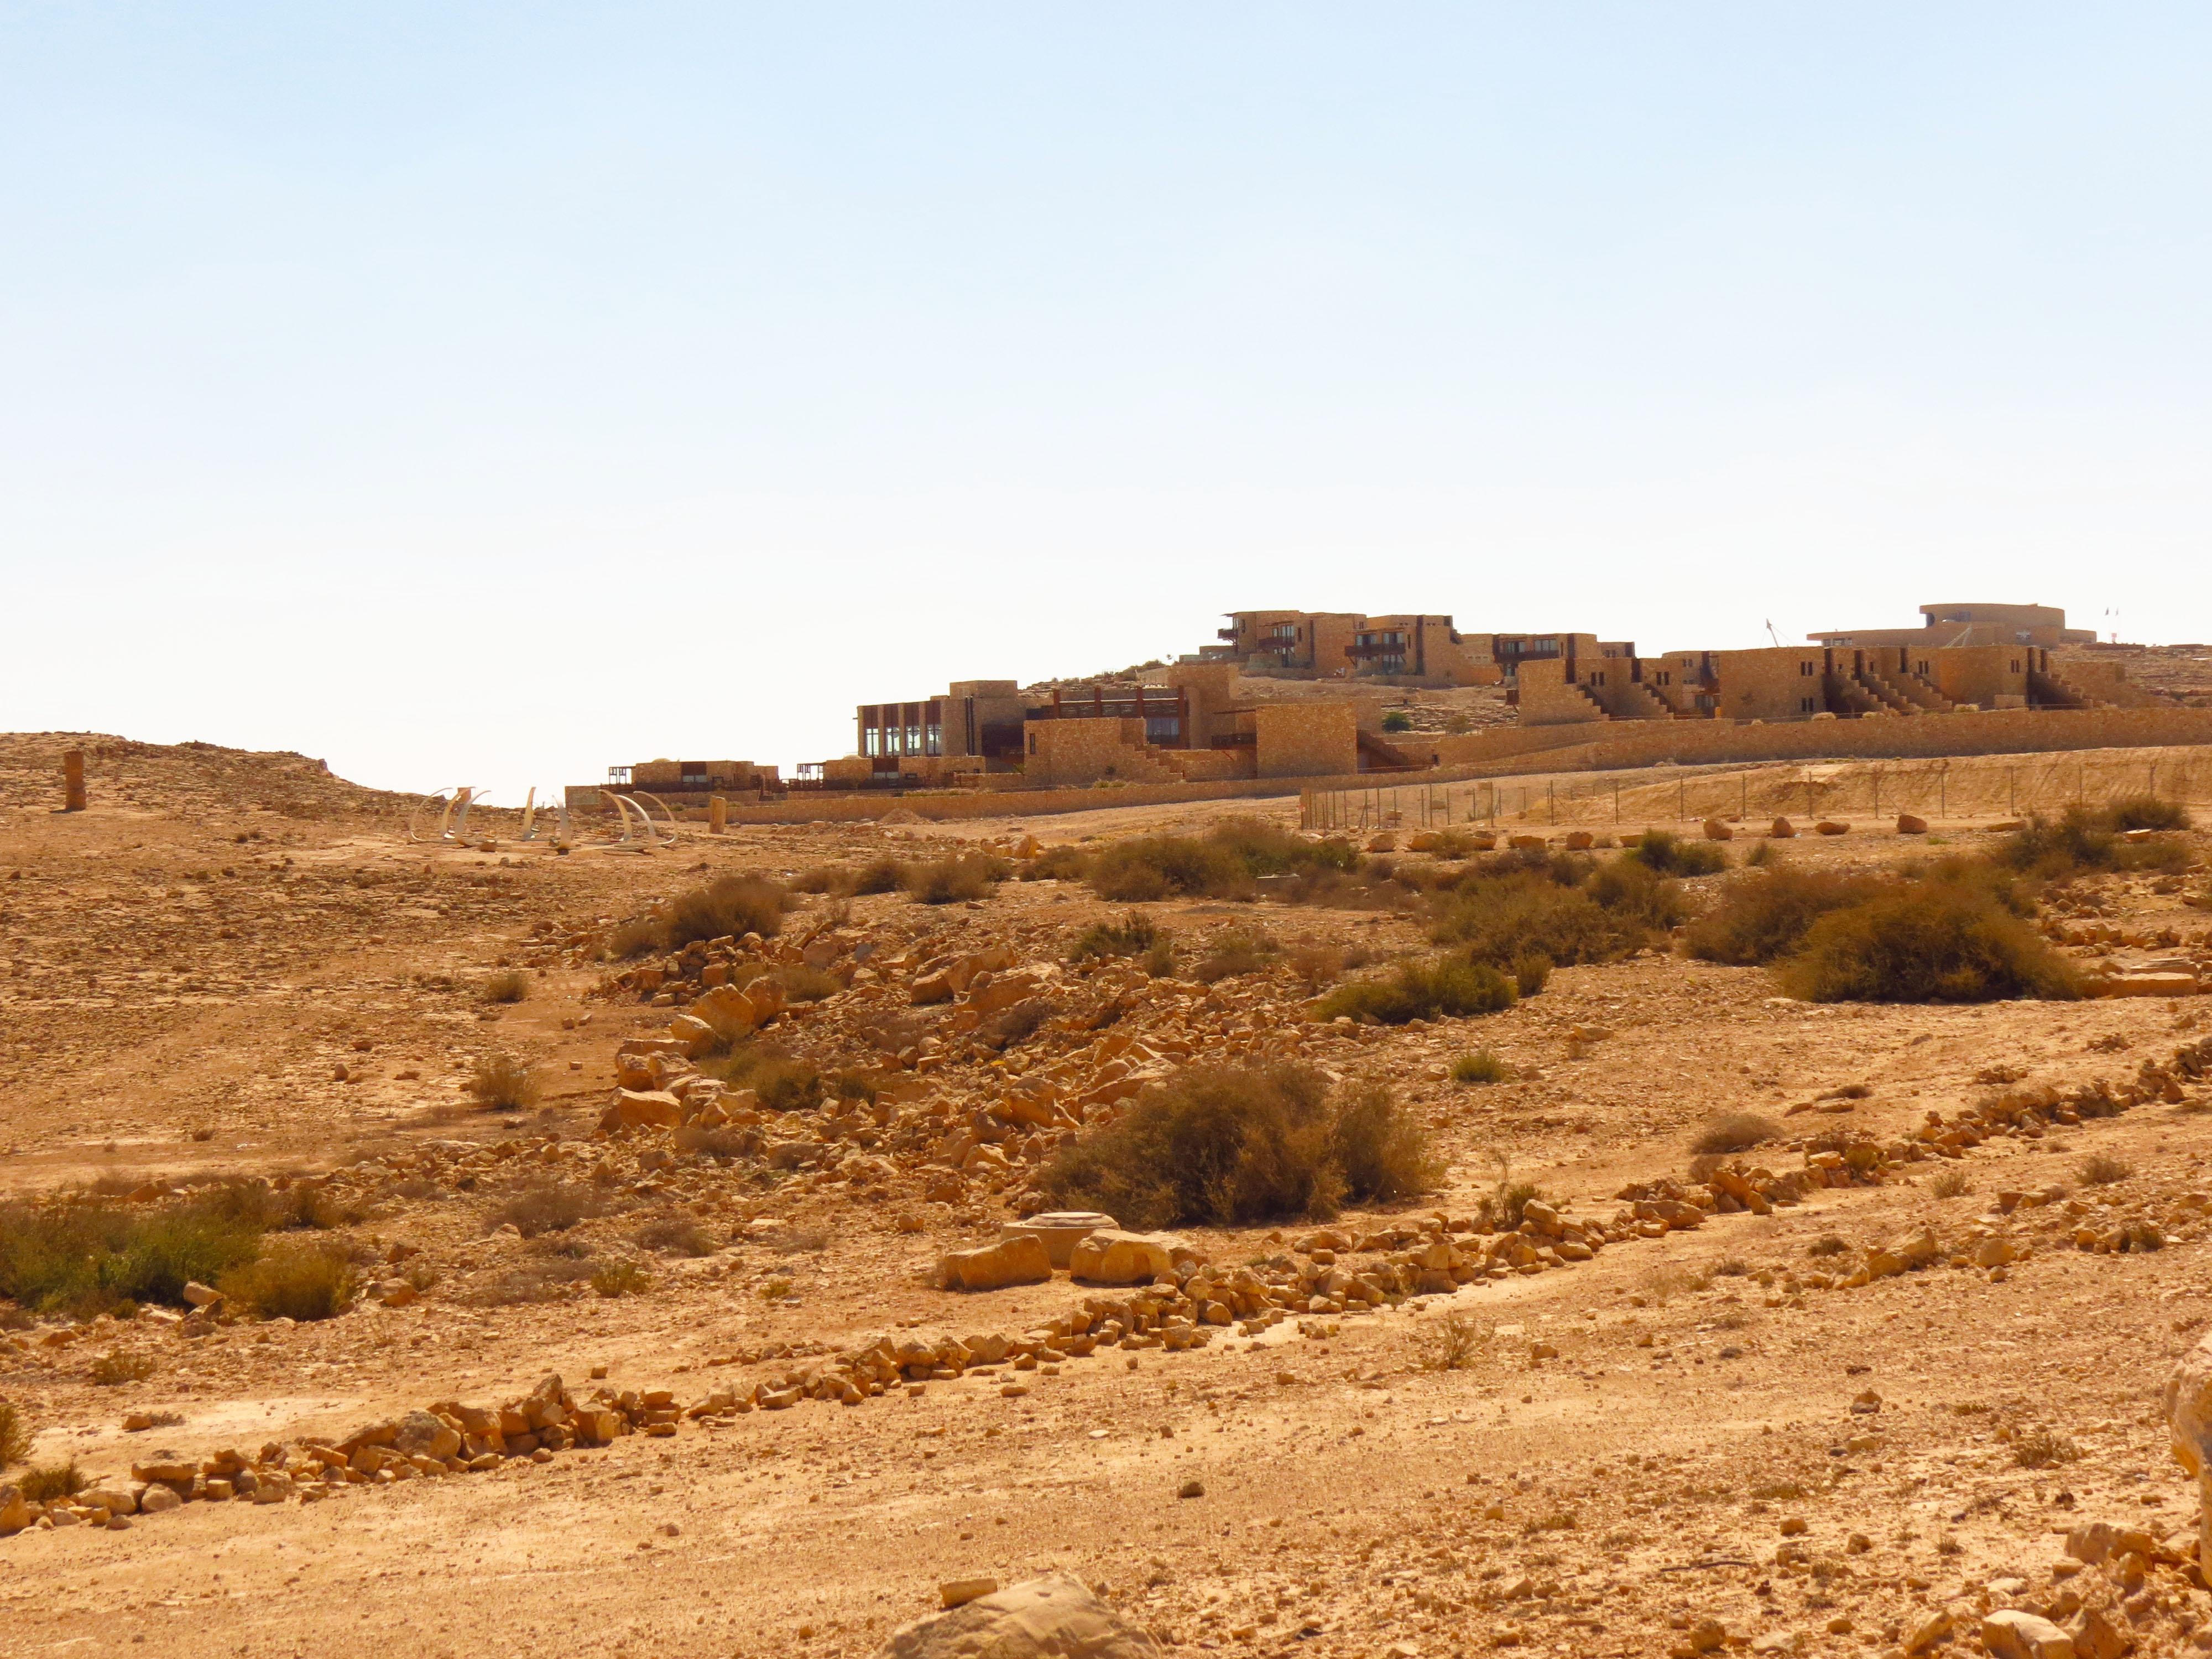 Related Keywords Amp Suggestions For Landscapes Desert Israel